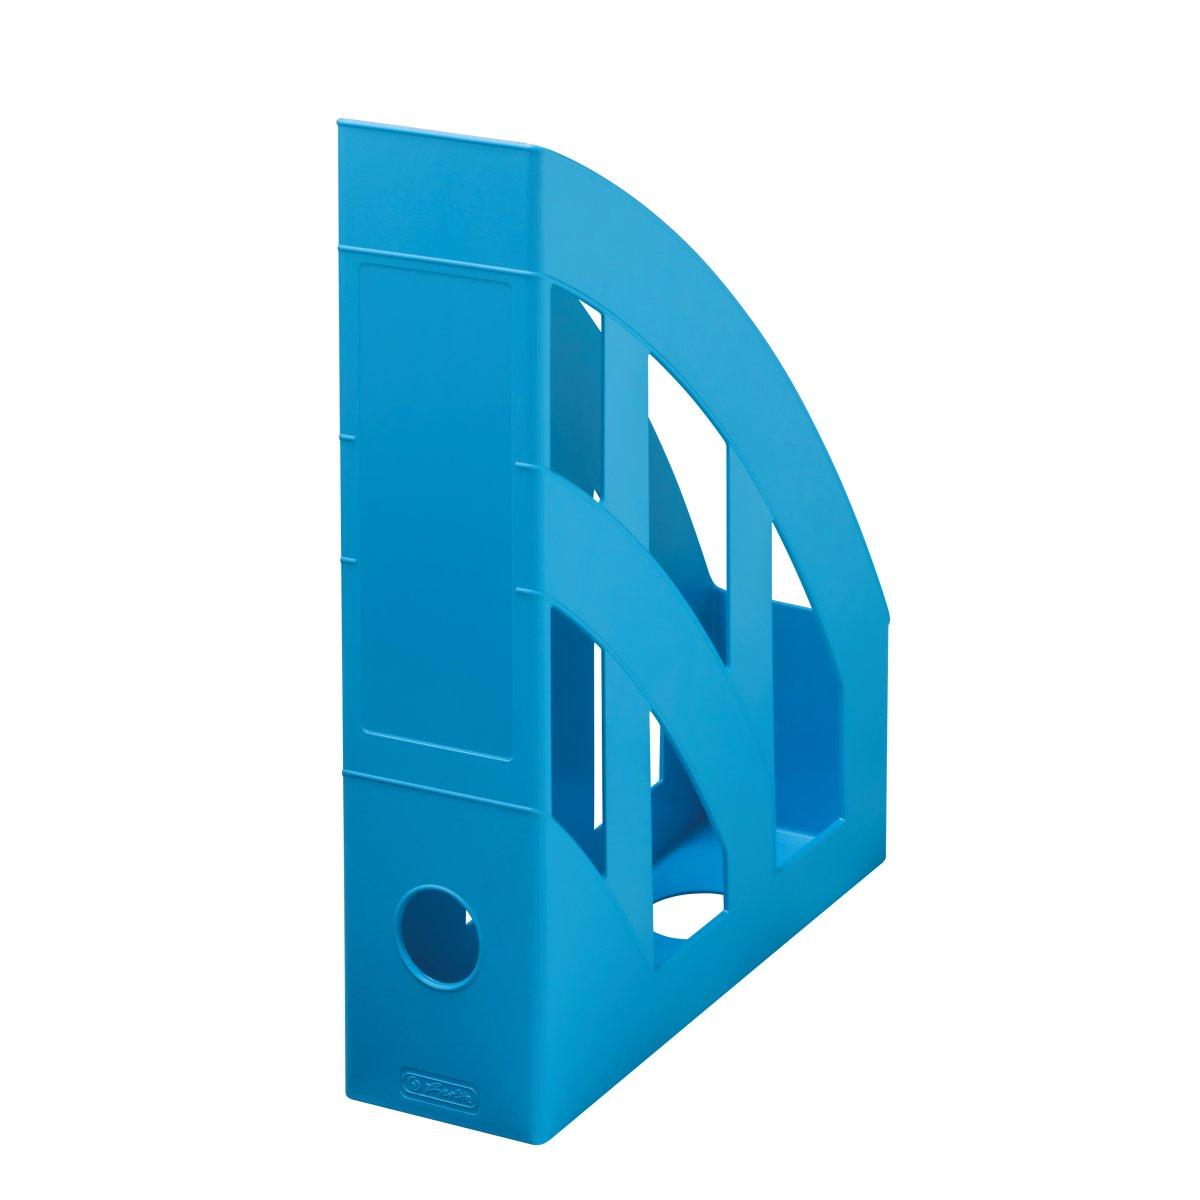 Stehsammler A4-C4 classic Herlitz recycling Blauer Engel intensiv blau